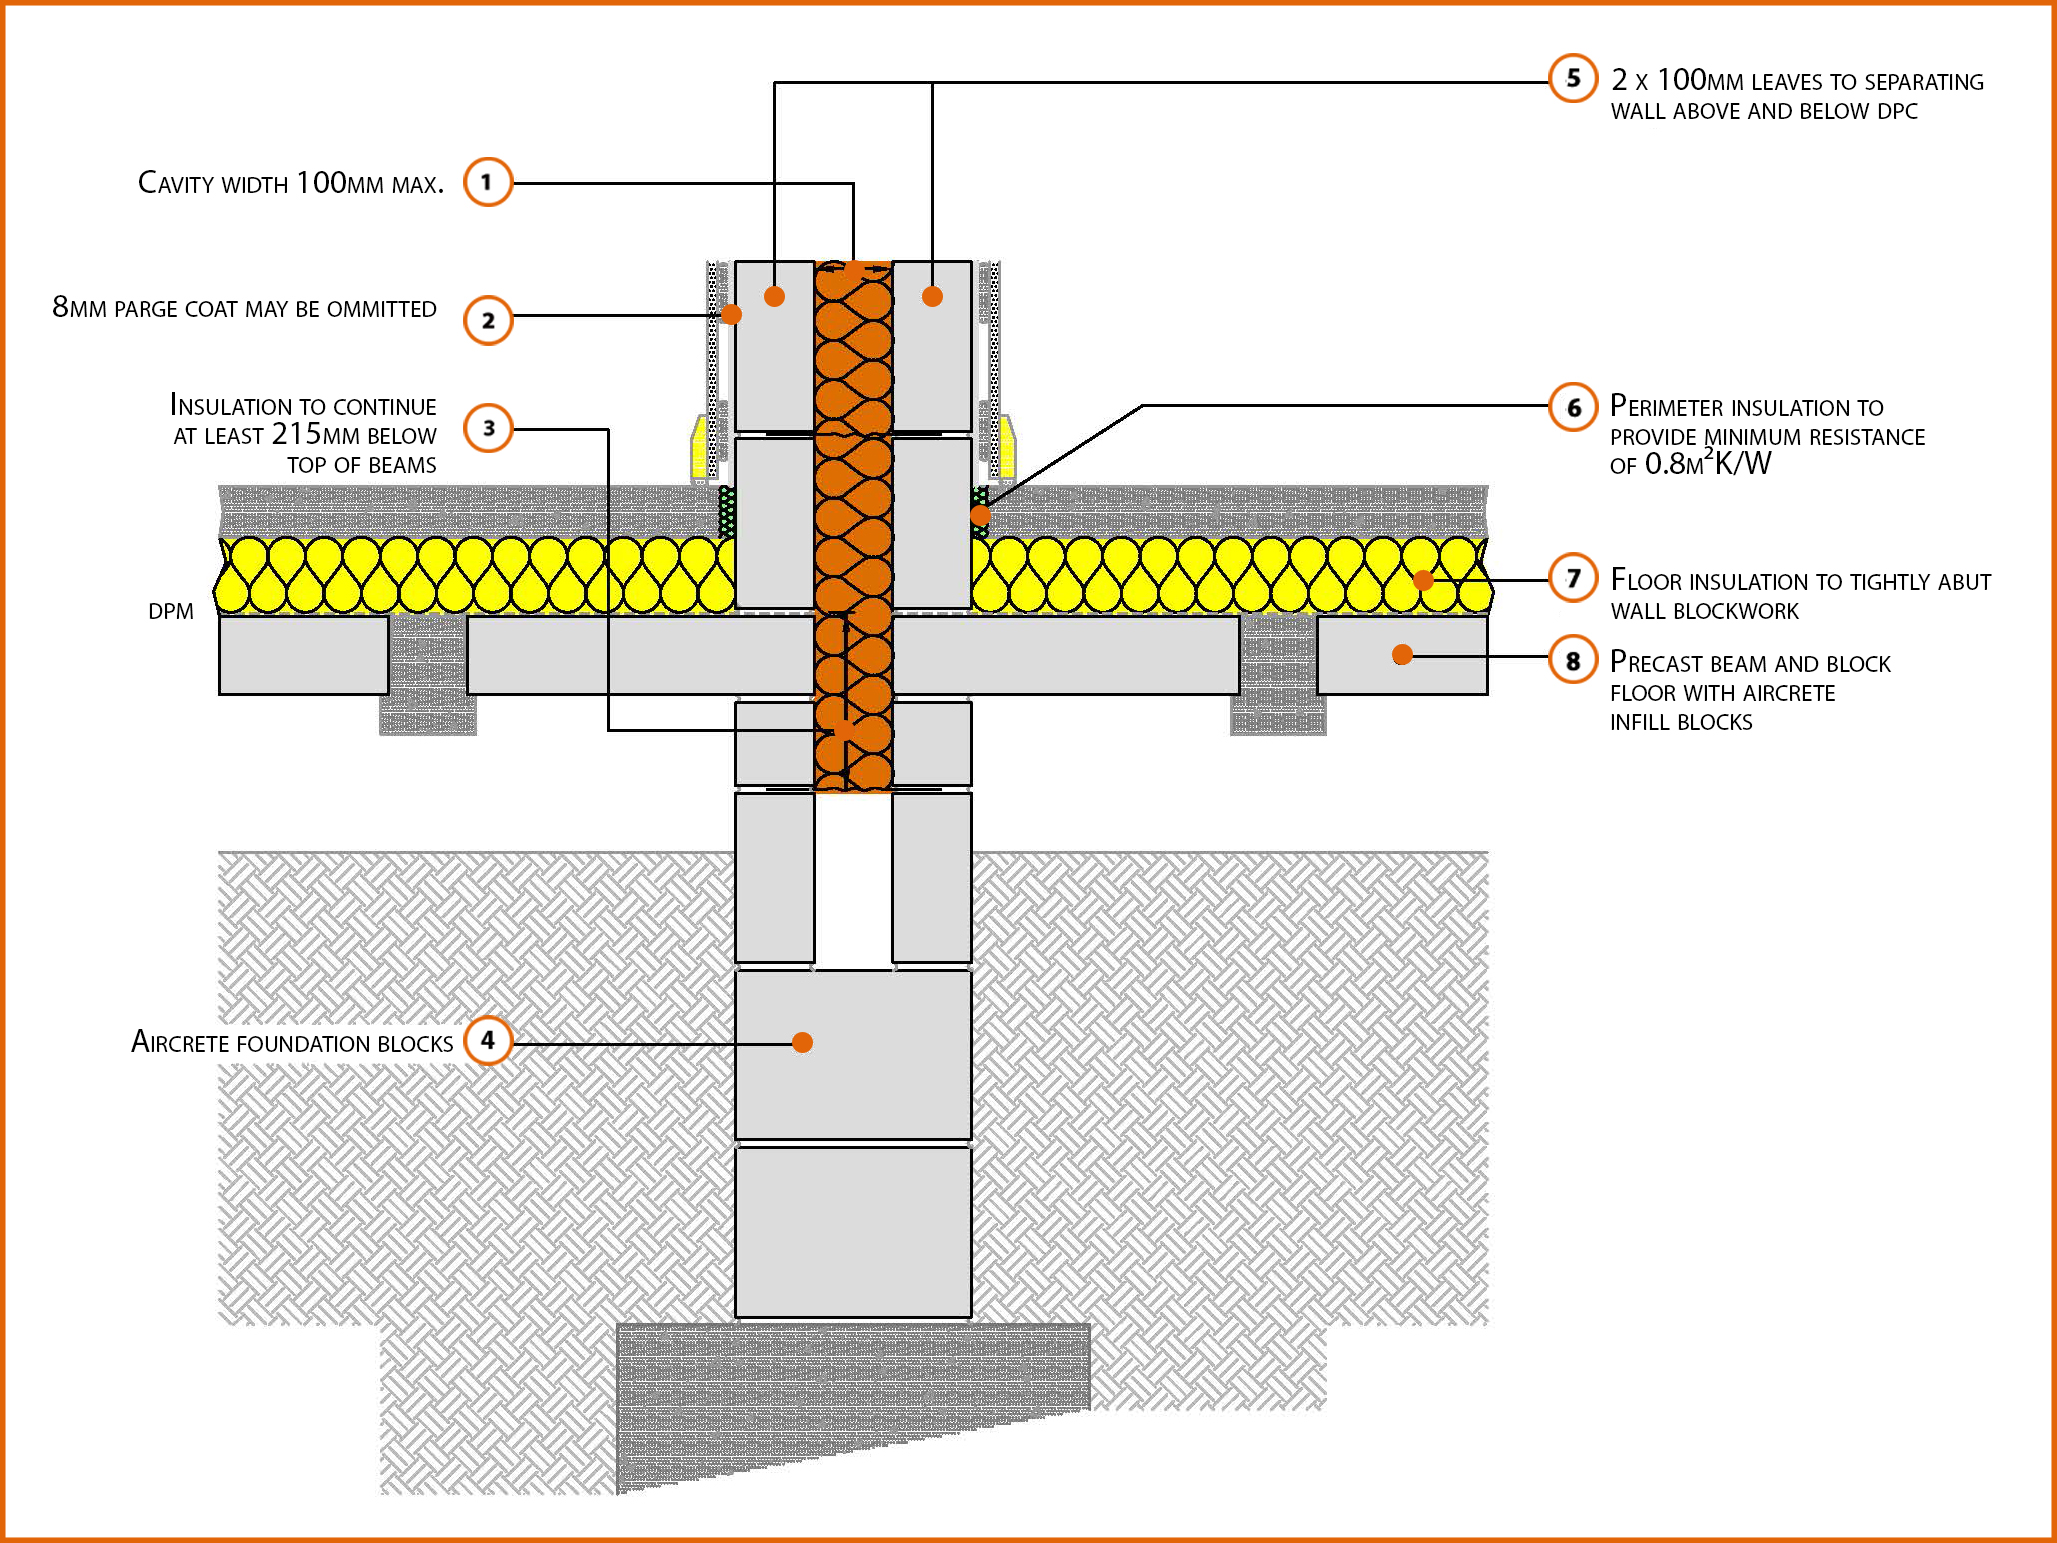 Beam And Block Floor >> P1pcff2 Suspended Beam And Block Floor Insulation Above